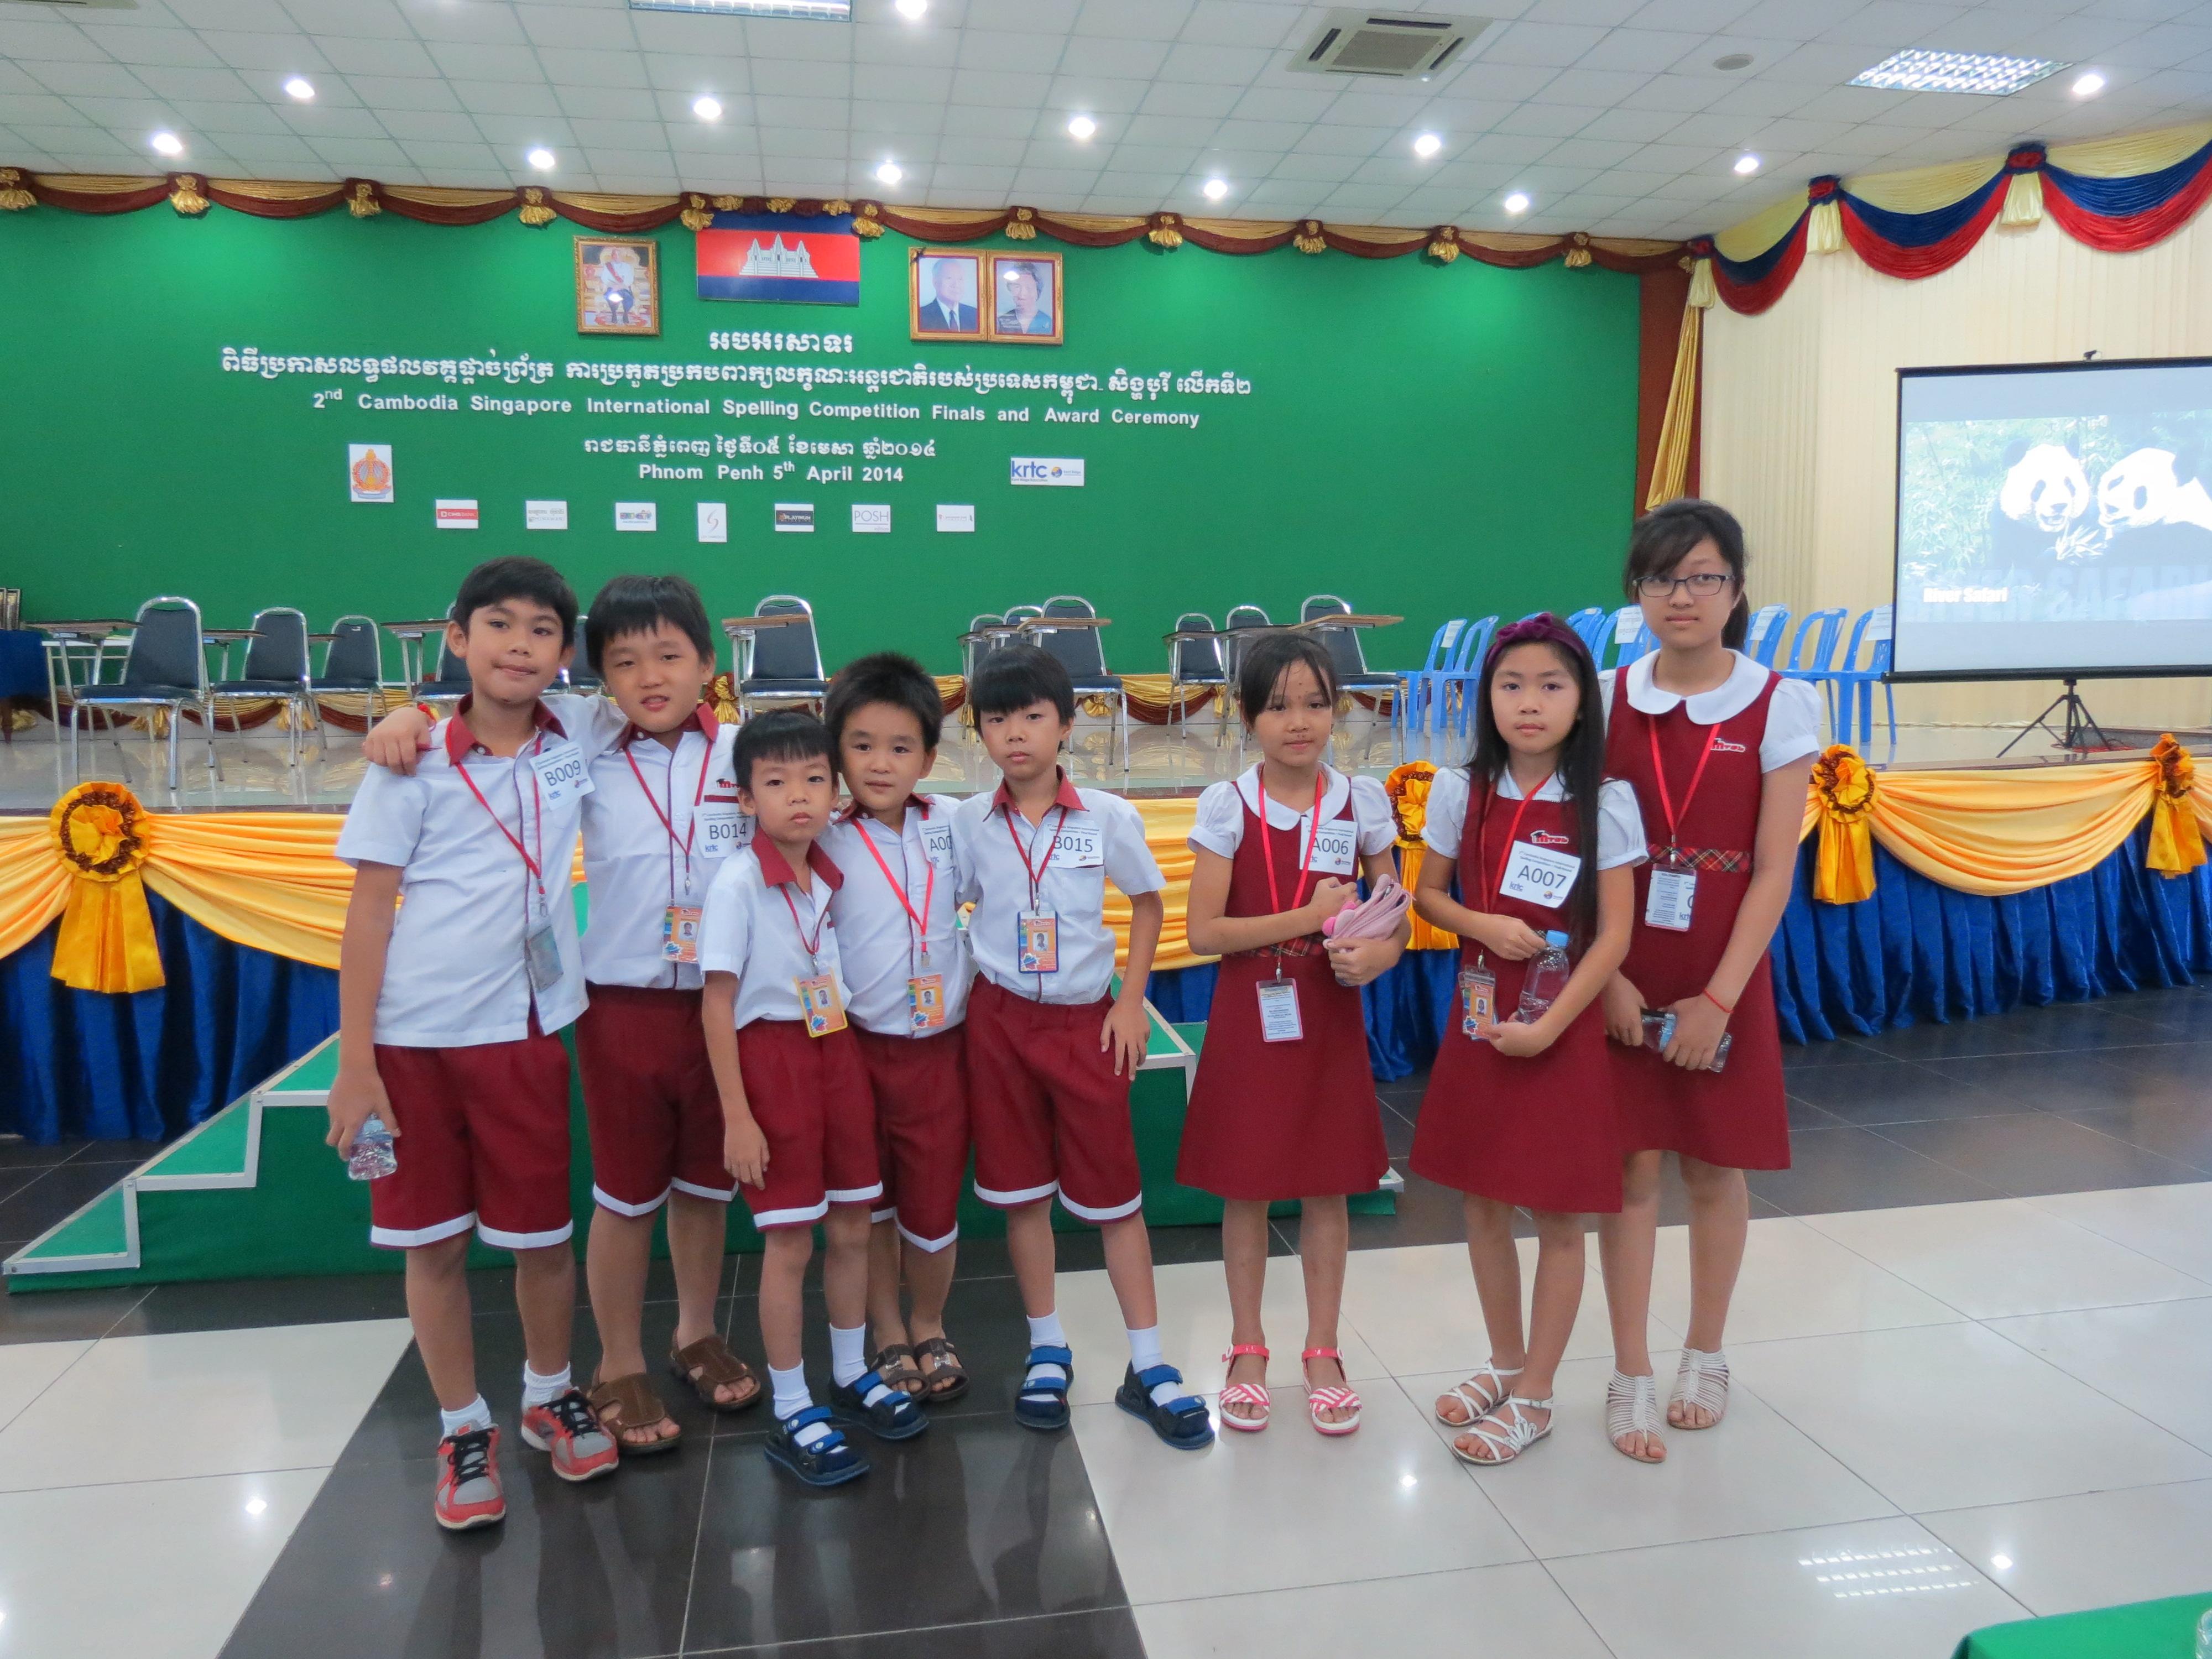 2014 Cambodia Singapore International Spelling Bee Contest